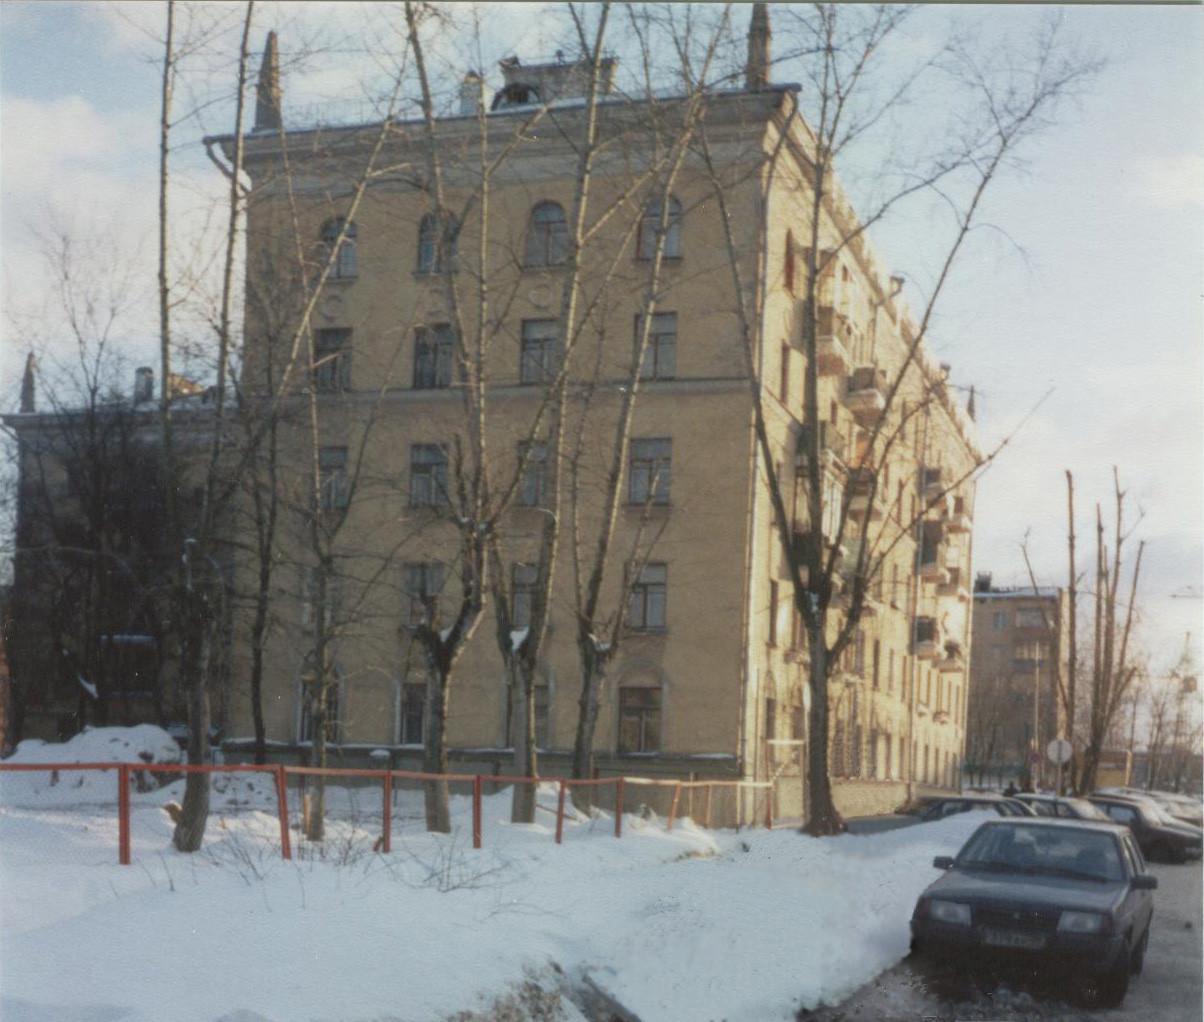 2001 Dom 17 перед сносом4